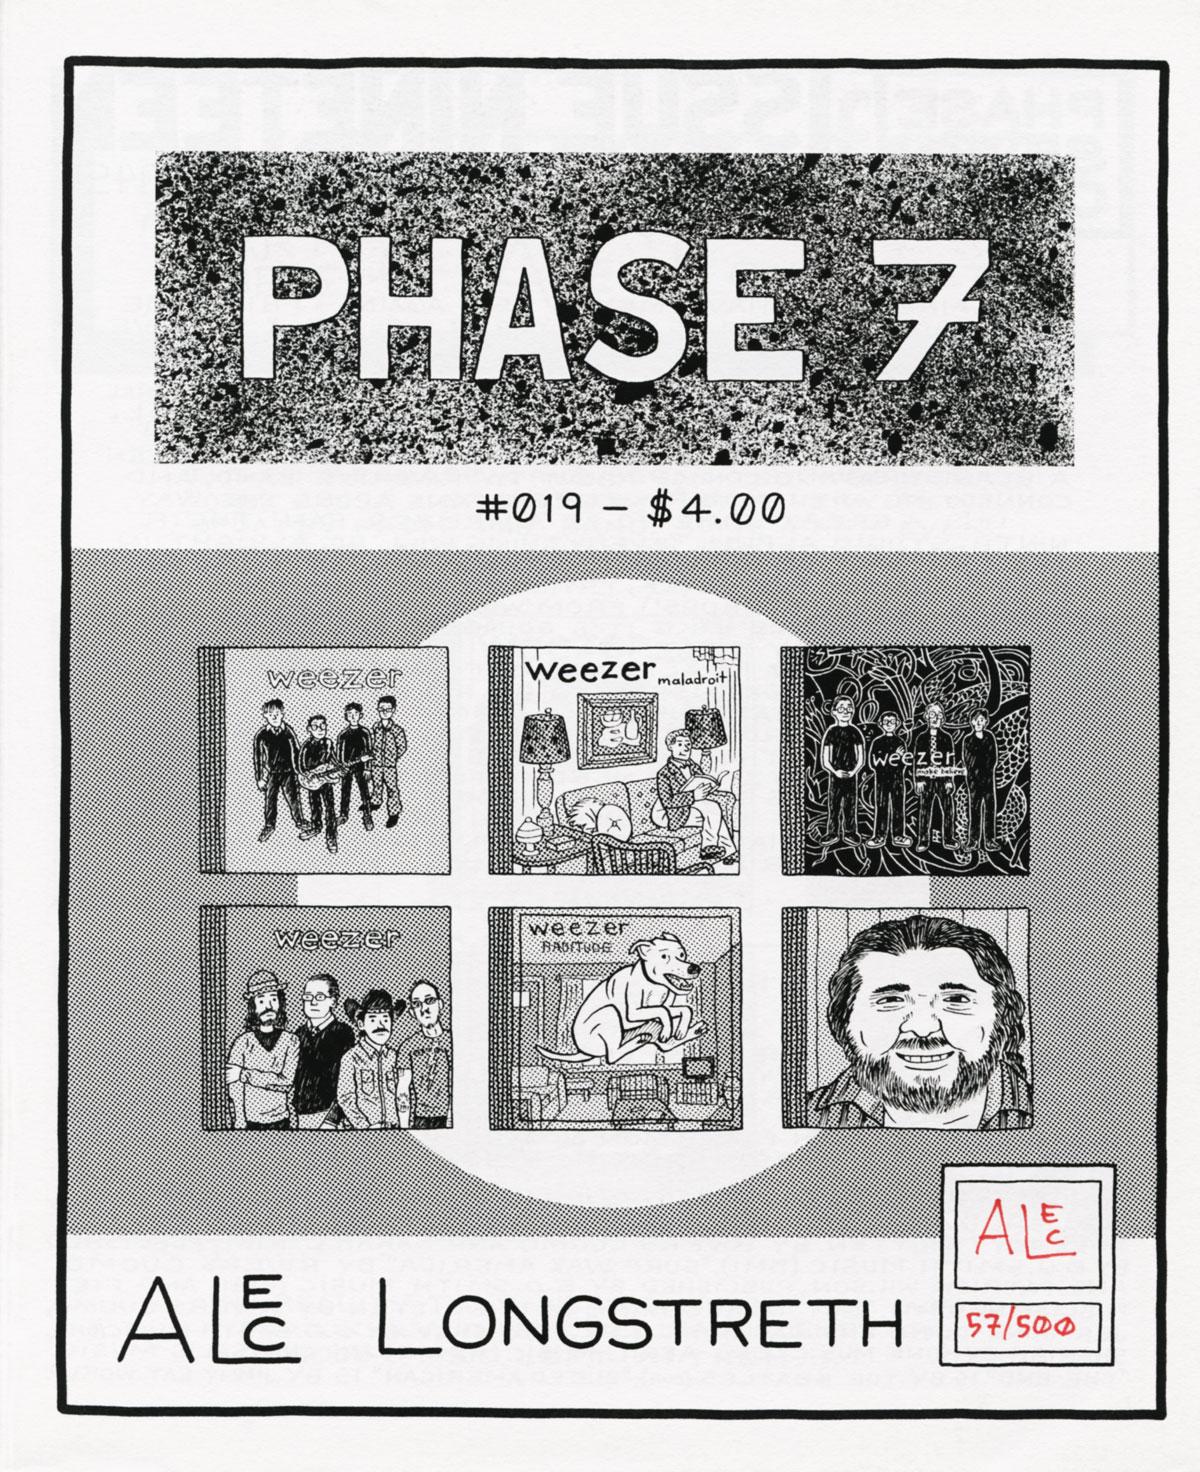 Phase 7 No. 019 by Alec Longstreth